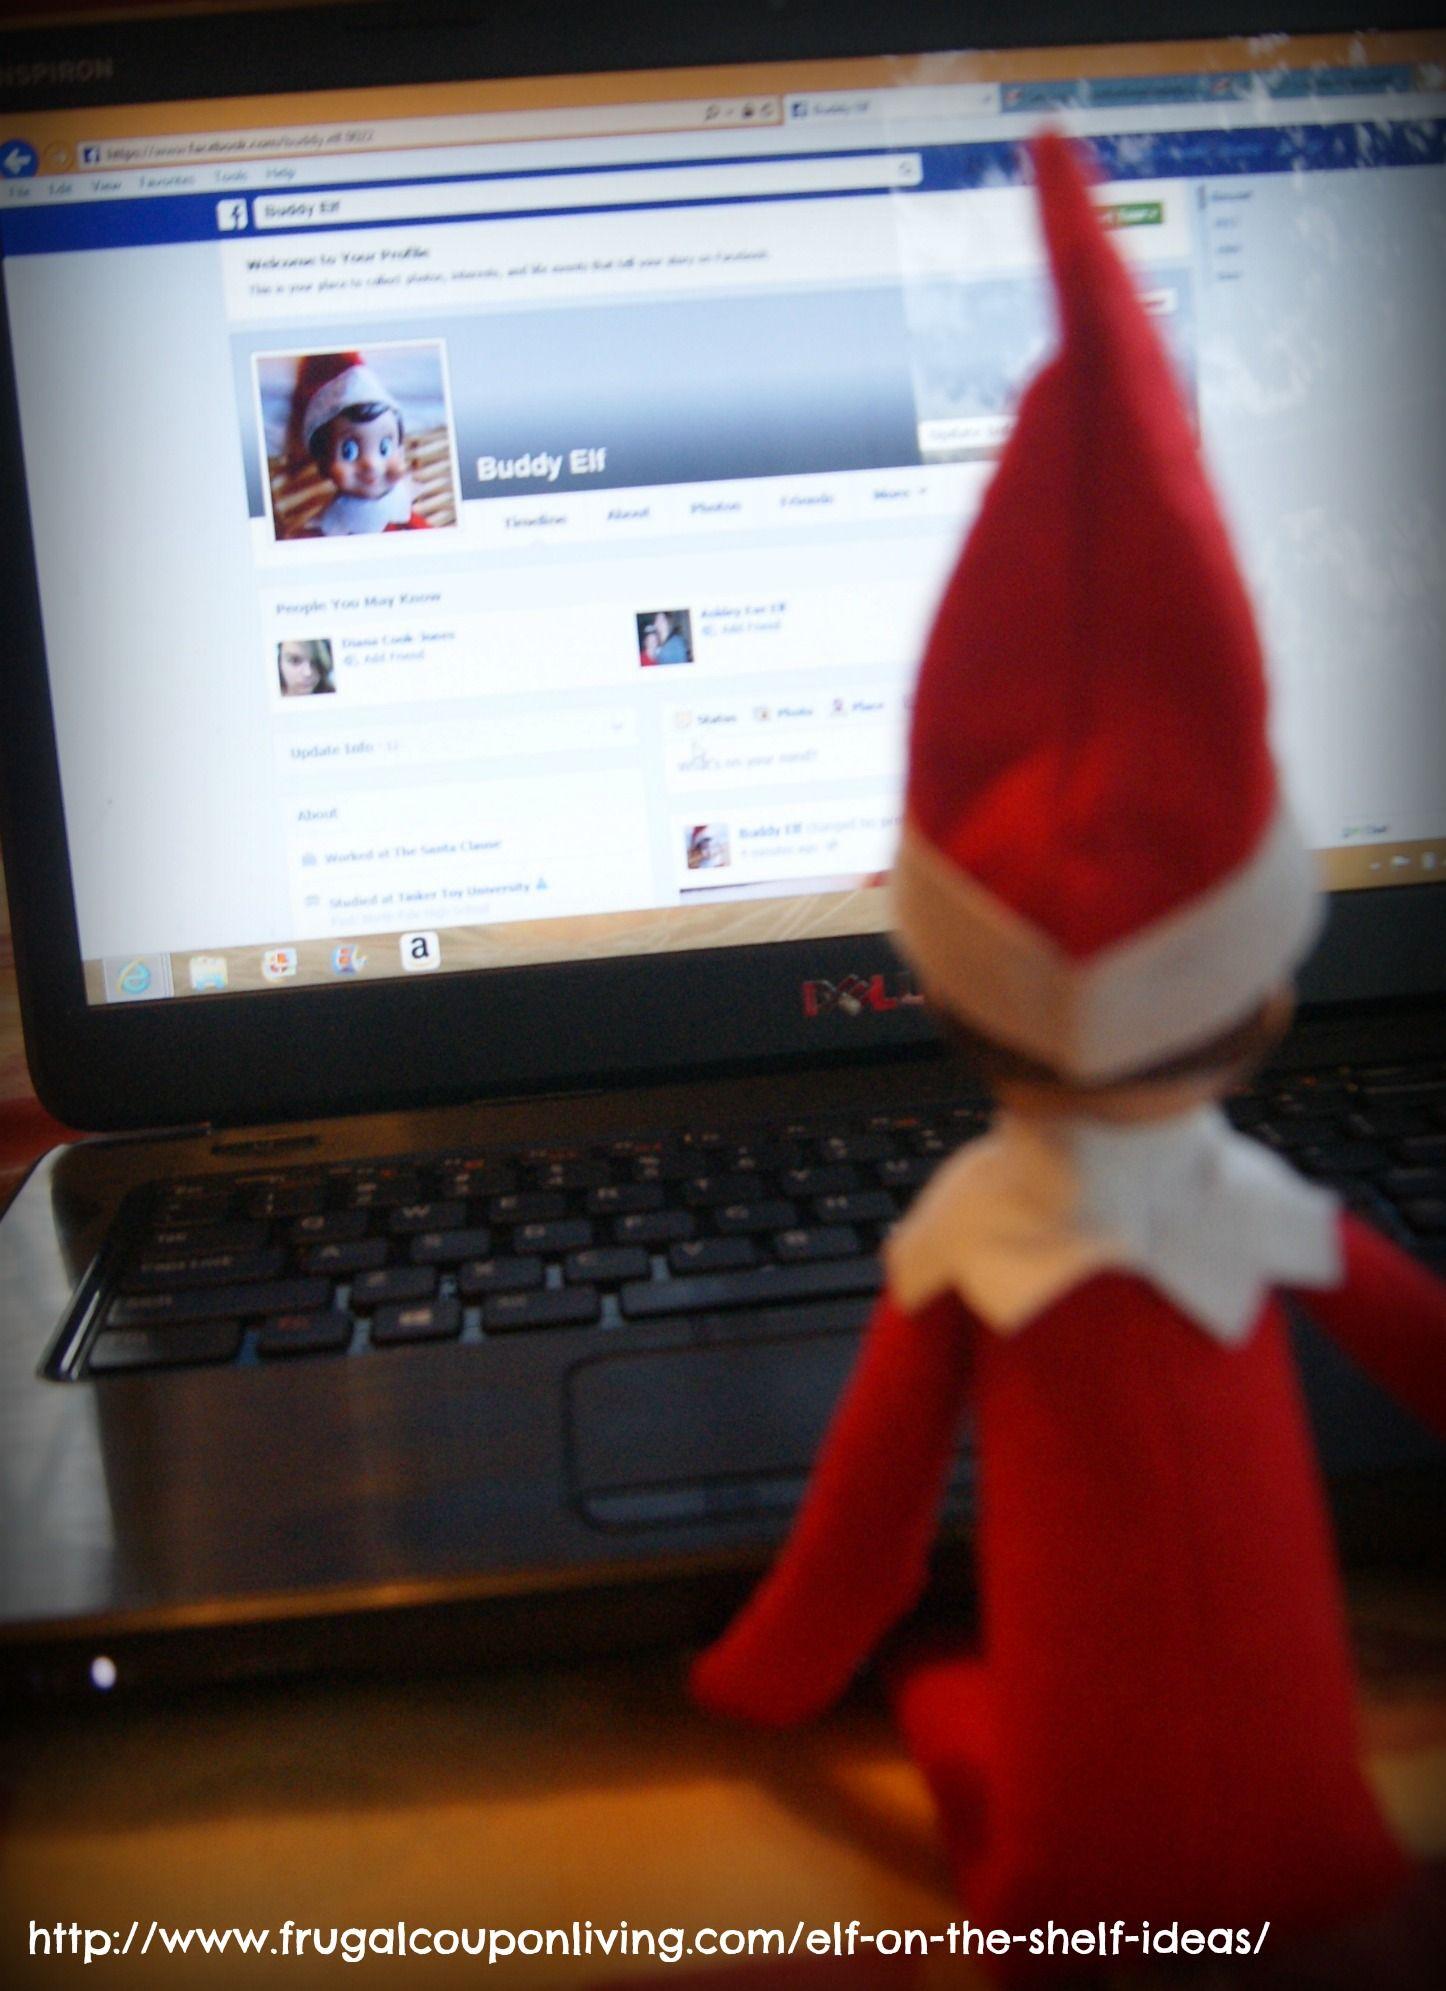 Elf on The Shelf Ideas - Buddy Elf on Facebook